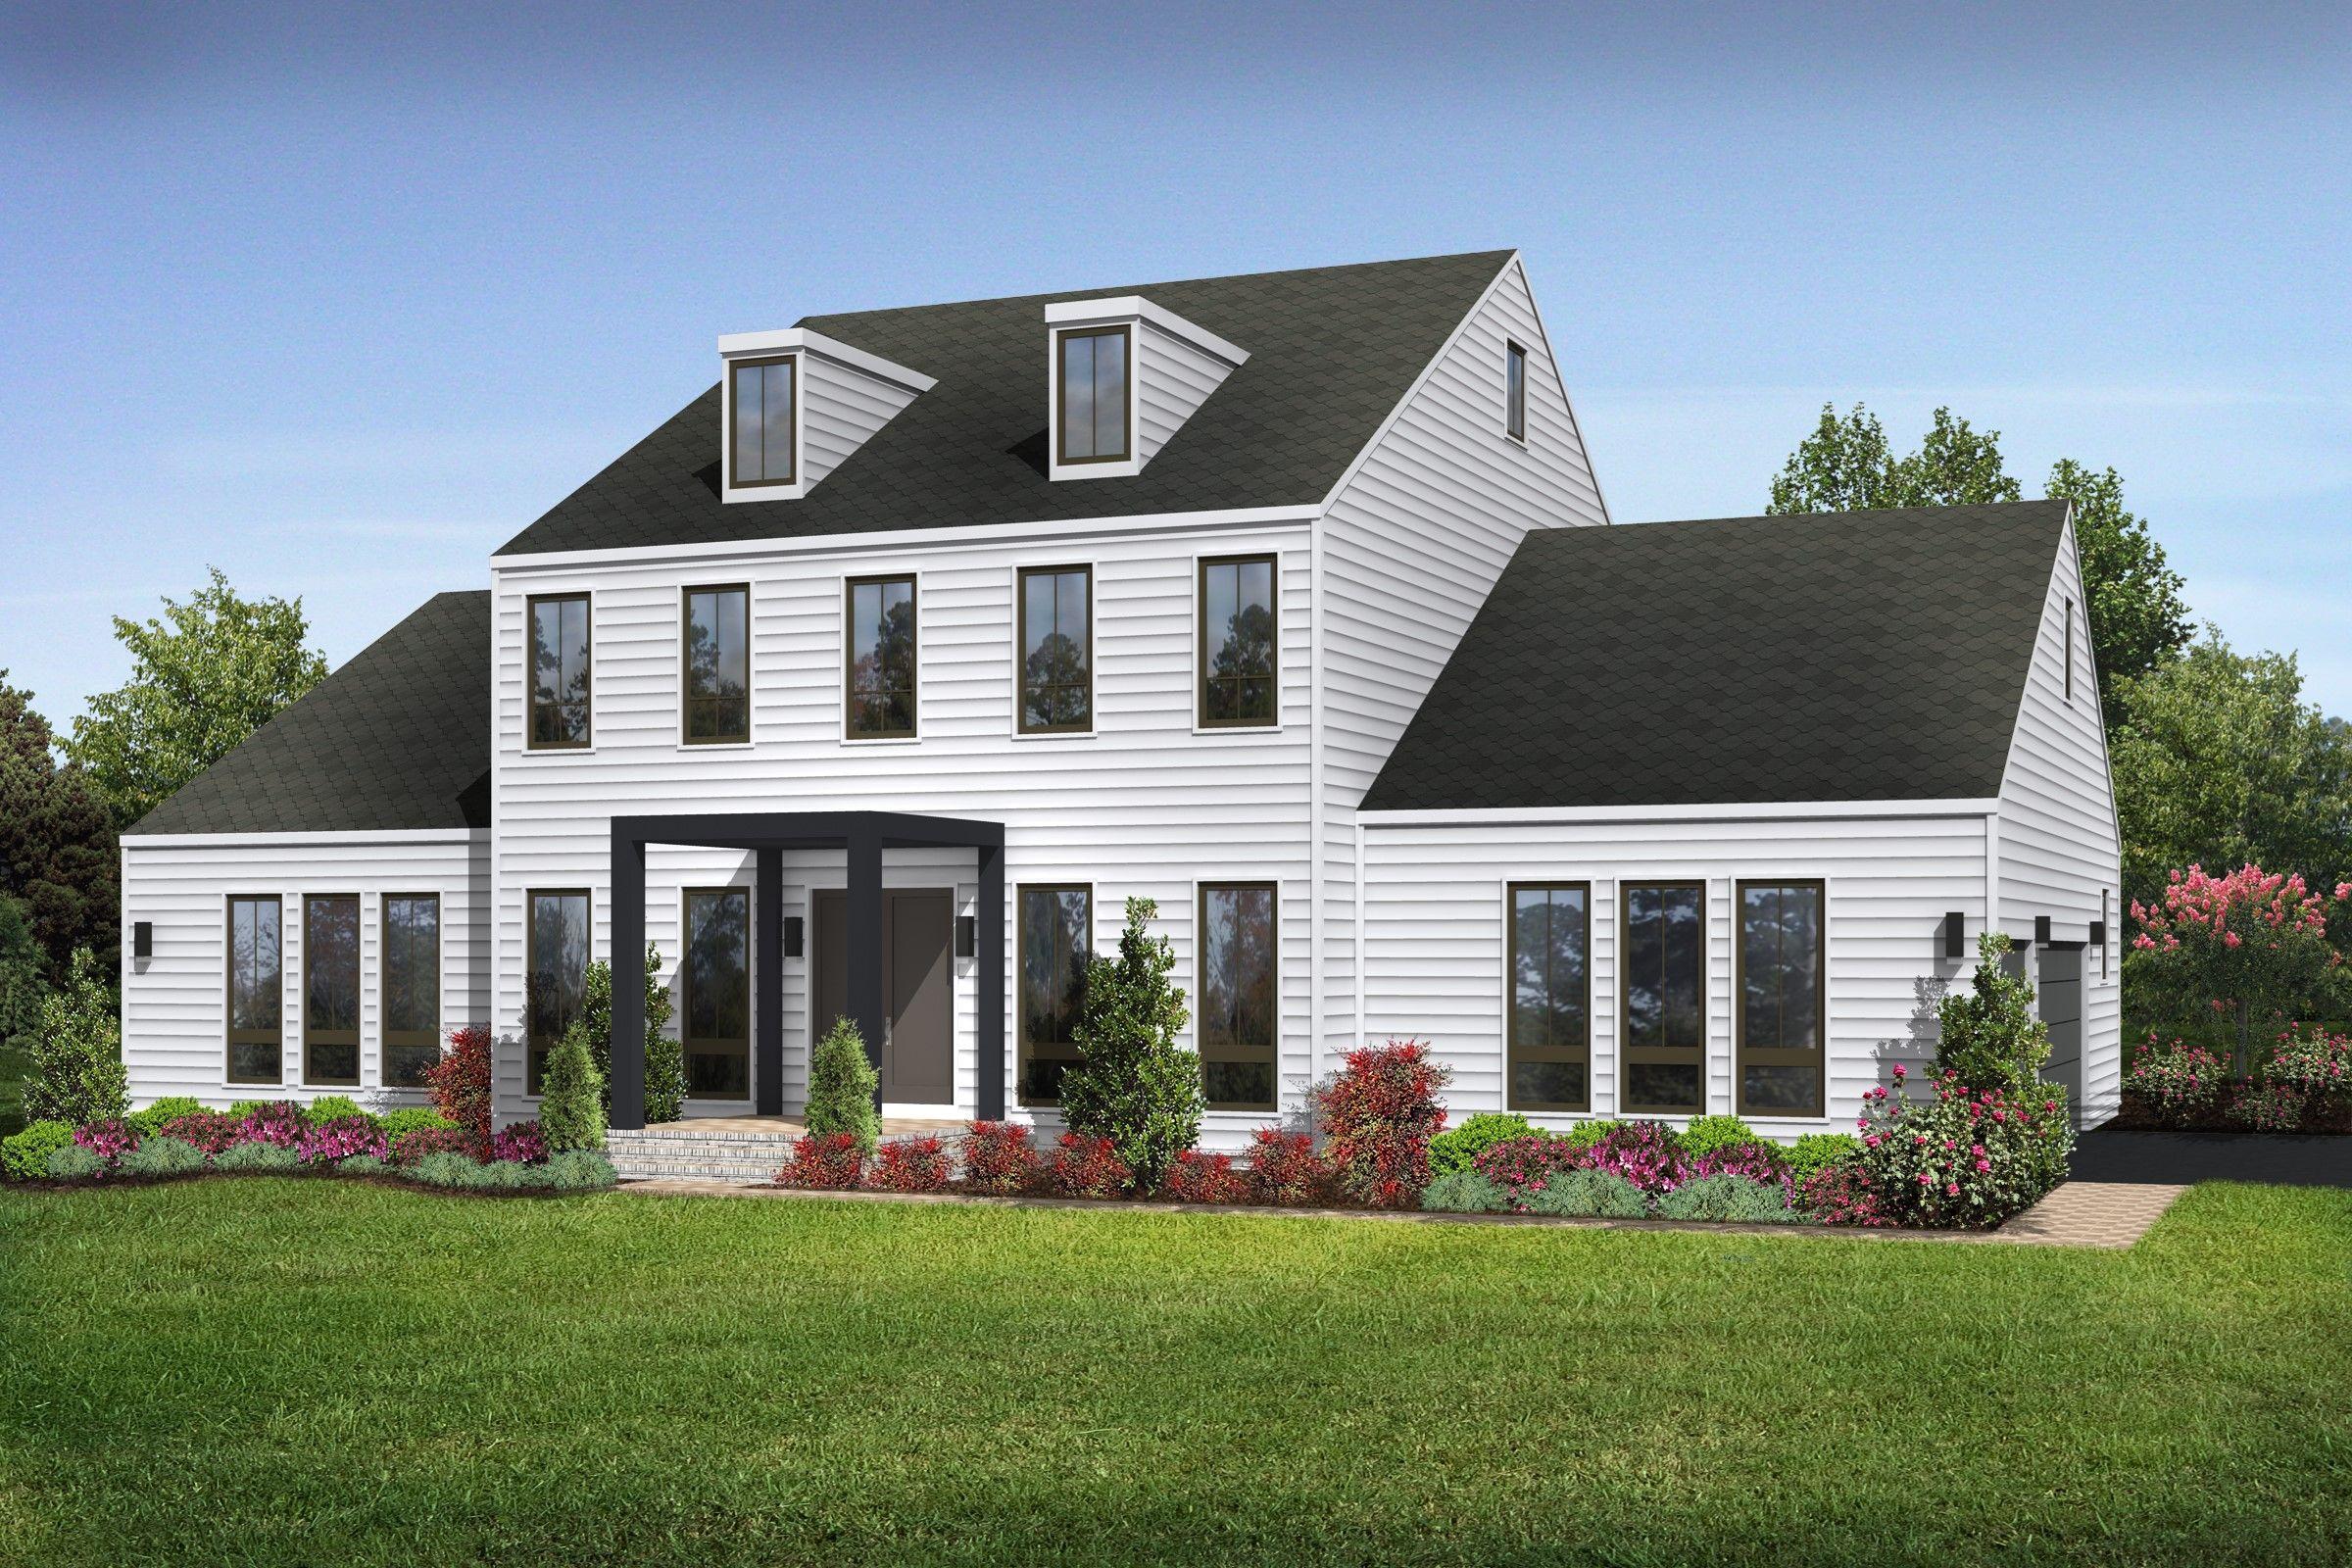 'Unique la famille' building or community at 'Line K at Thompson's Grant 964 Walker Road Ashburn, Virginia 20148 United States'